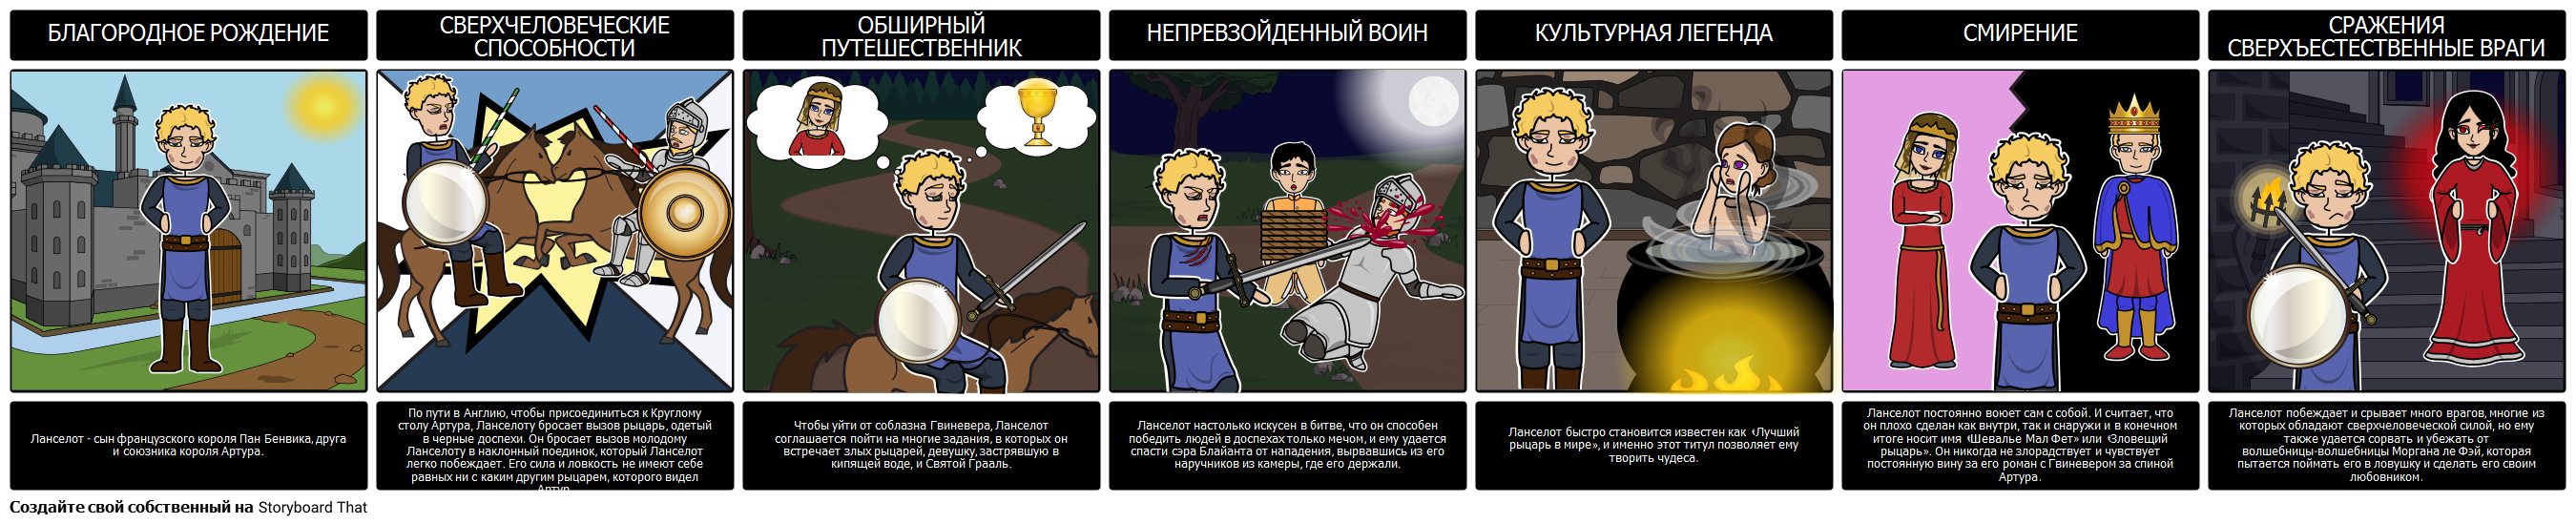 "TOAFK - богатырь в ""Ill-Made Knight"""